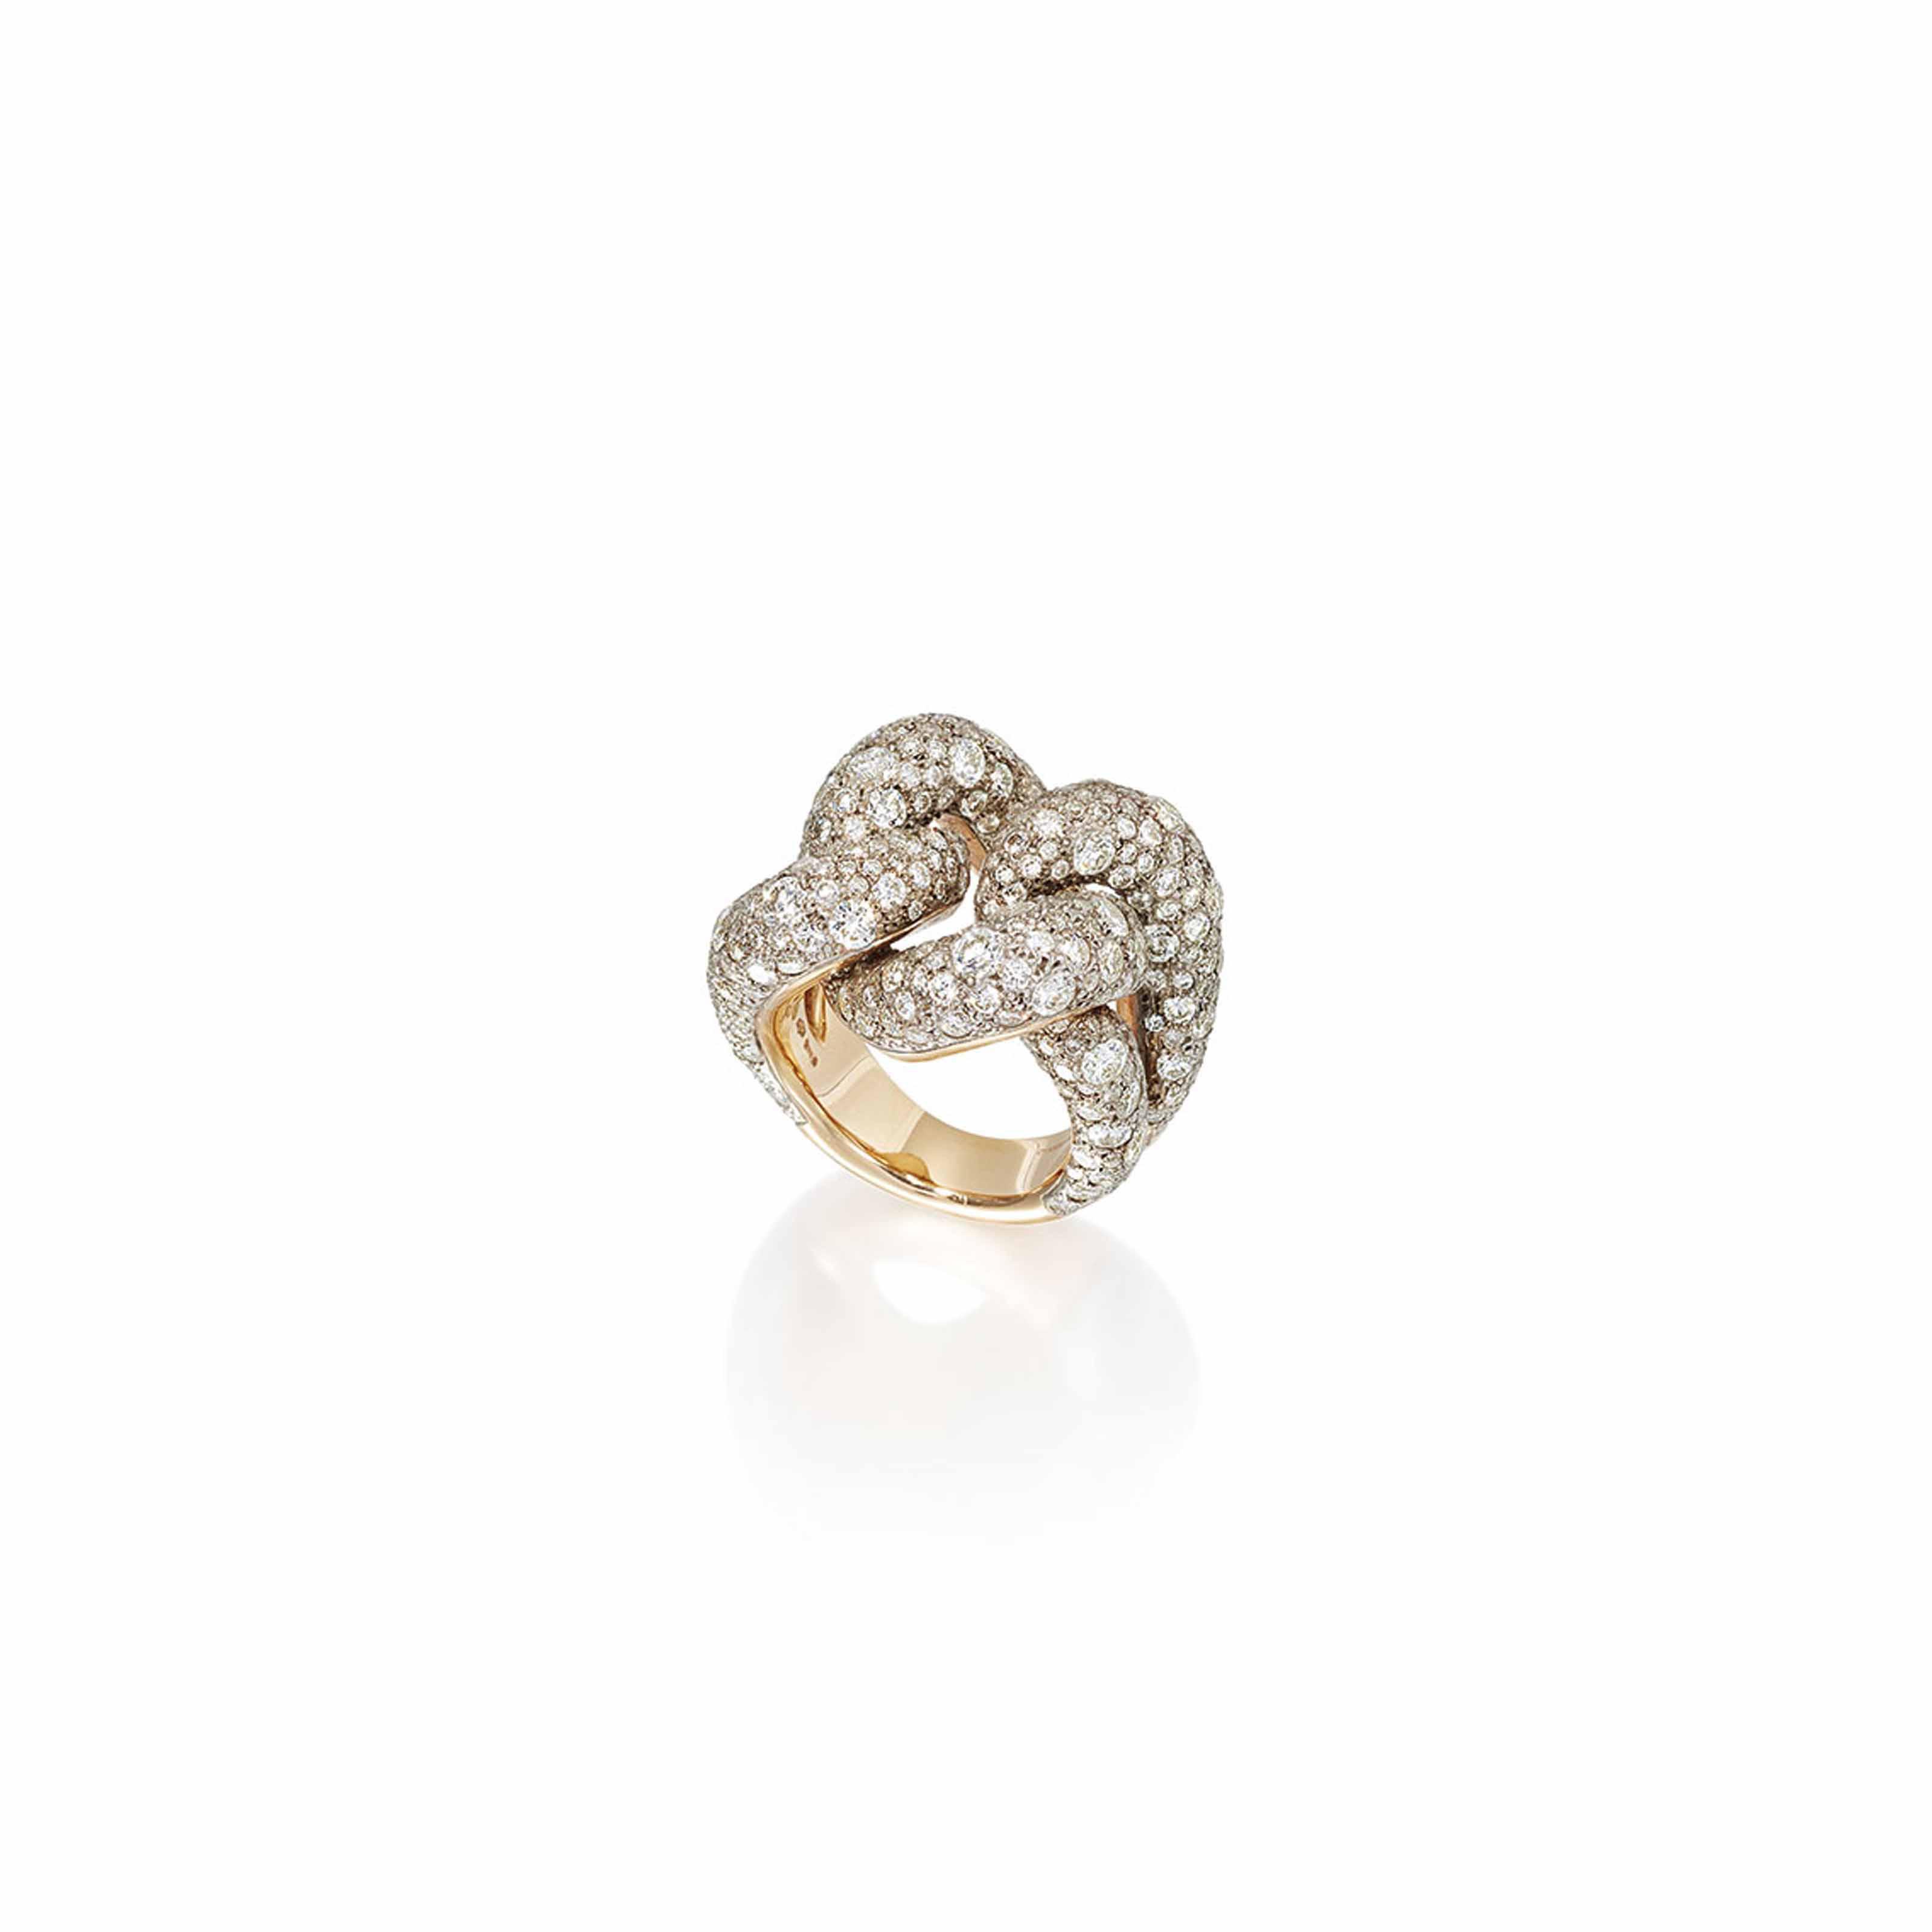 DIAMOND 'TANGO' RING, POMELLATO